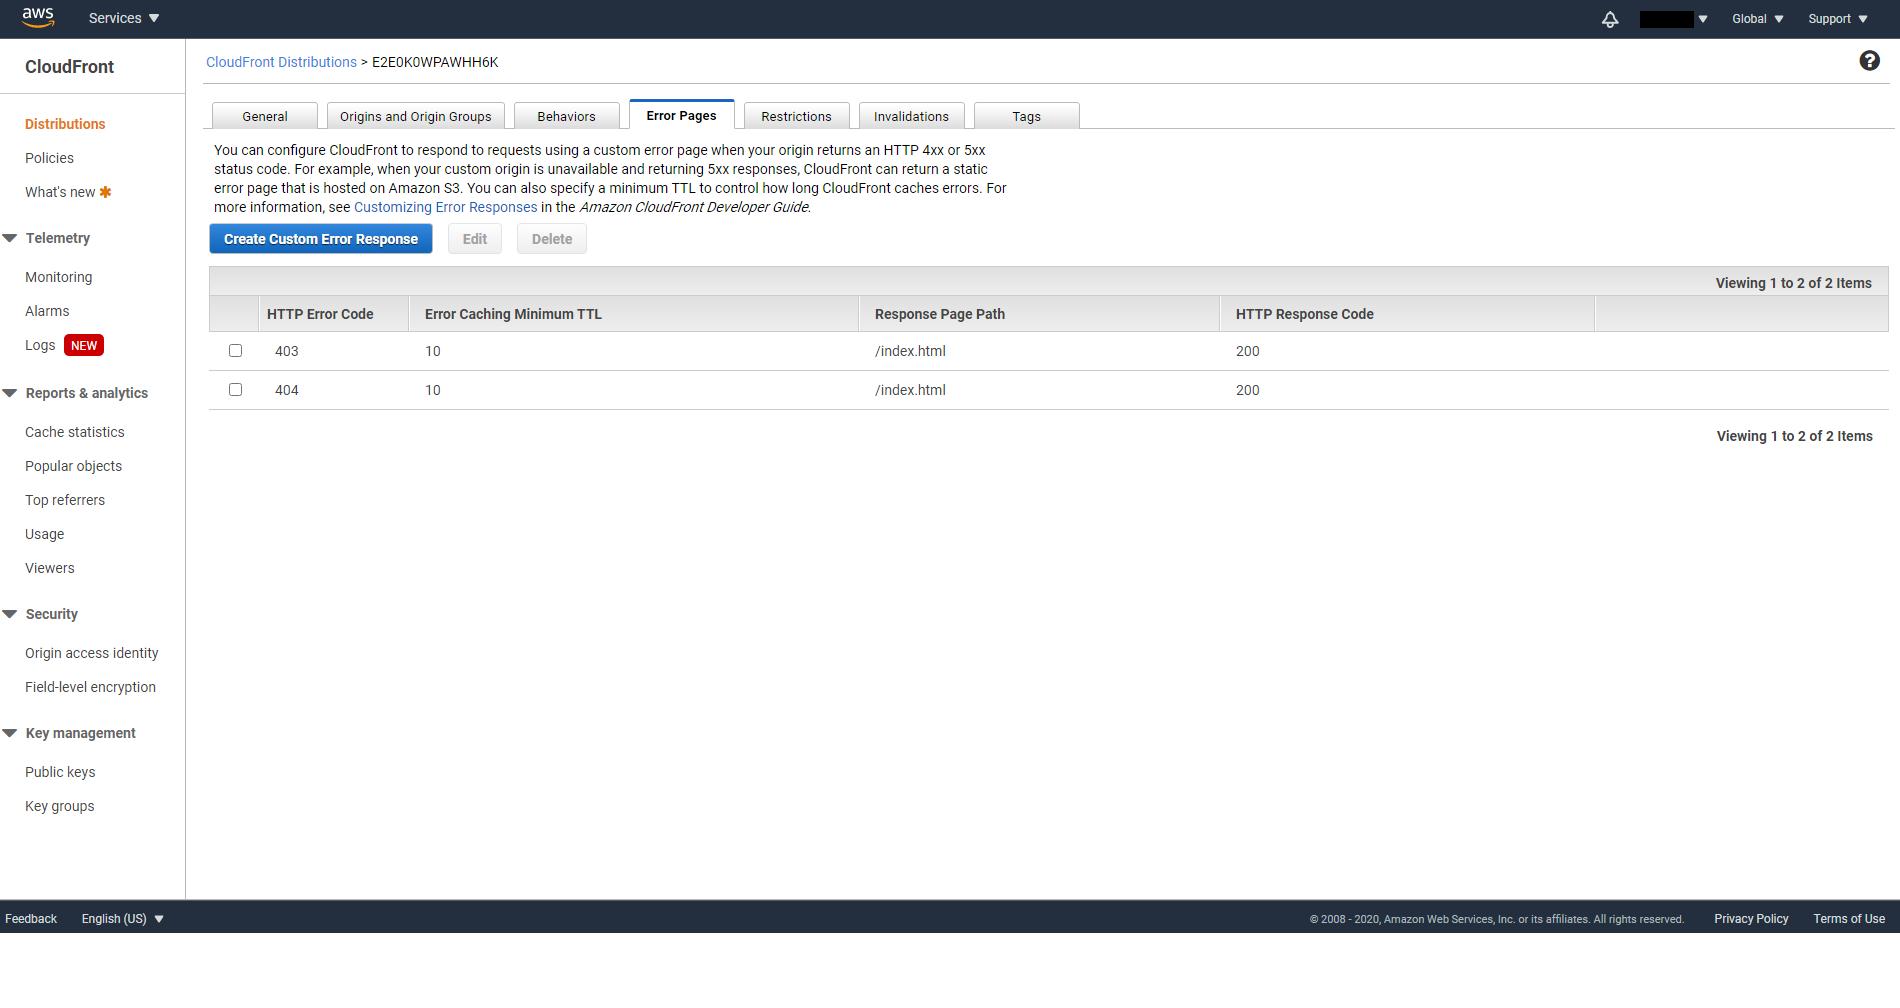 Custom error responses created on CloudFront